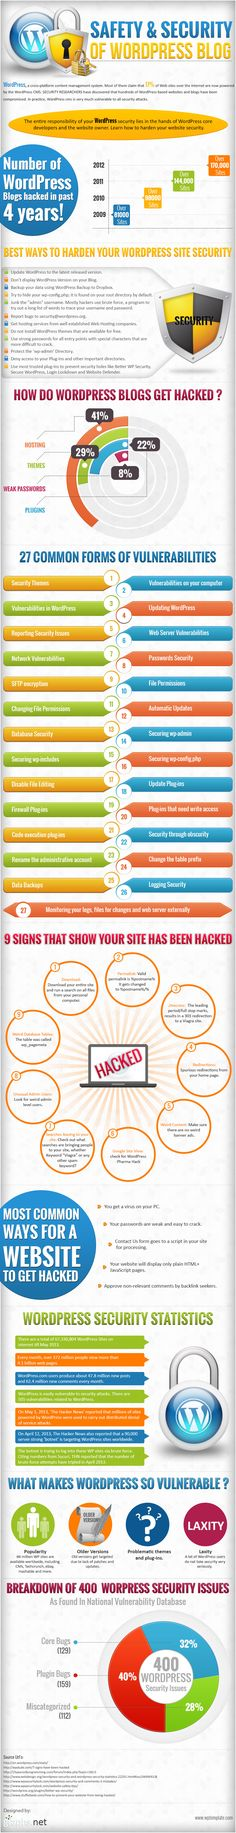 #Infografia sobre la seguridad de wordpress